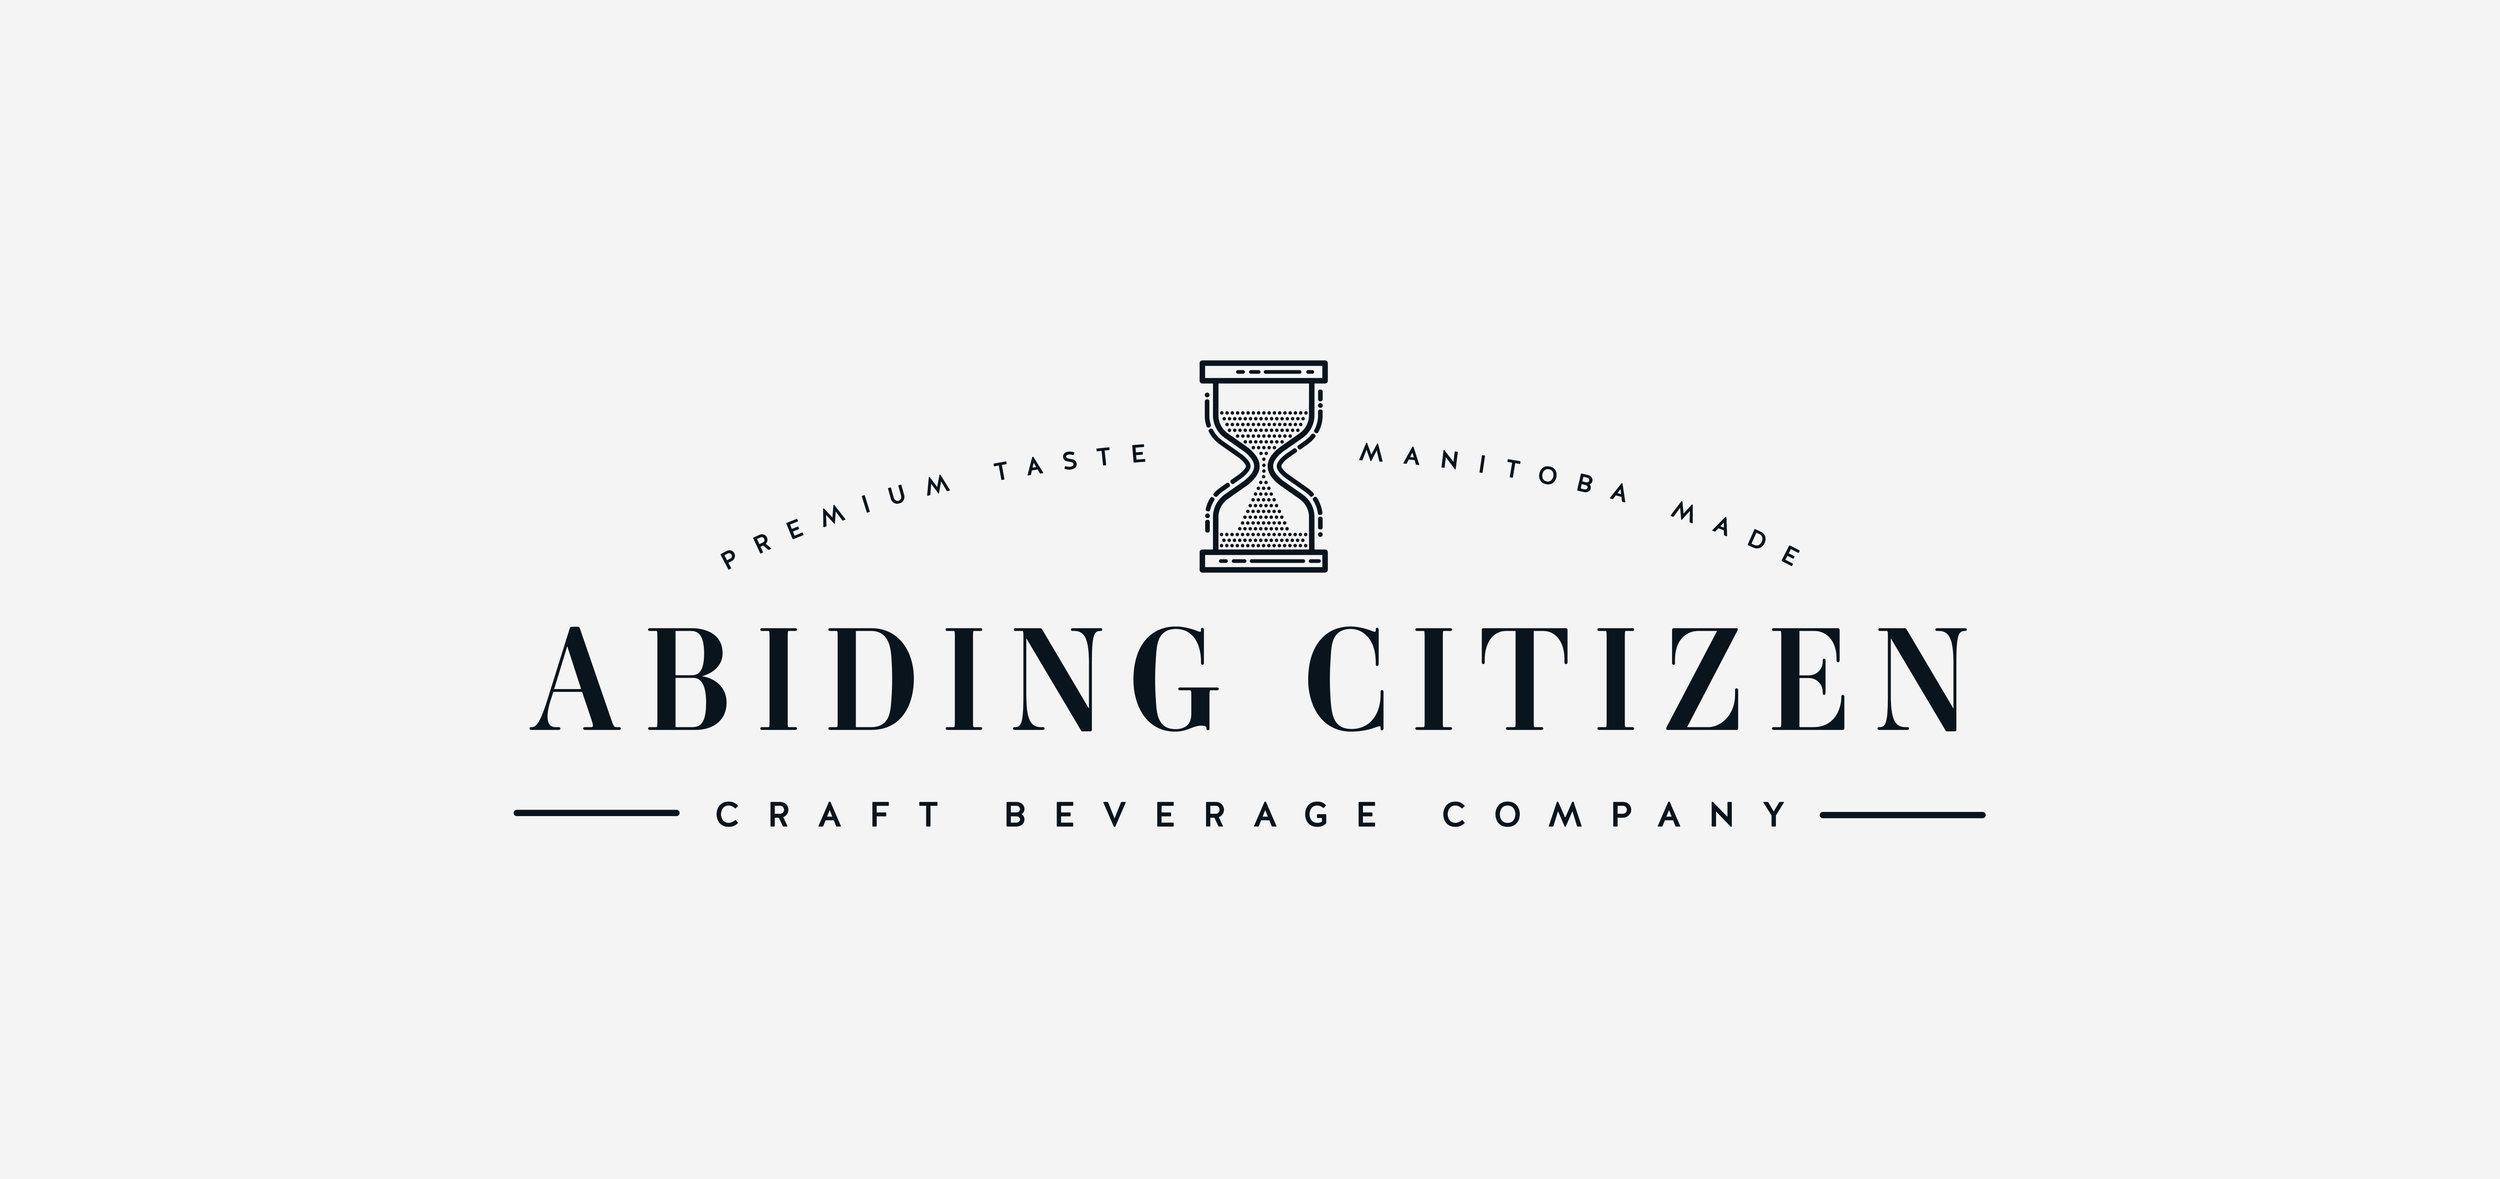 abiding-citizen-craft-beverage-company-branding-design-clover-and-crow